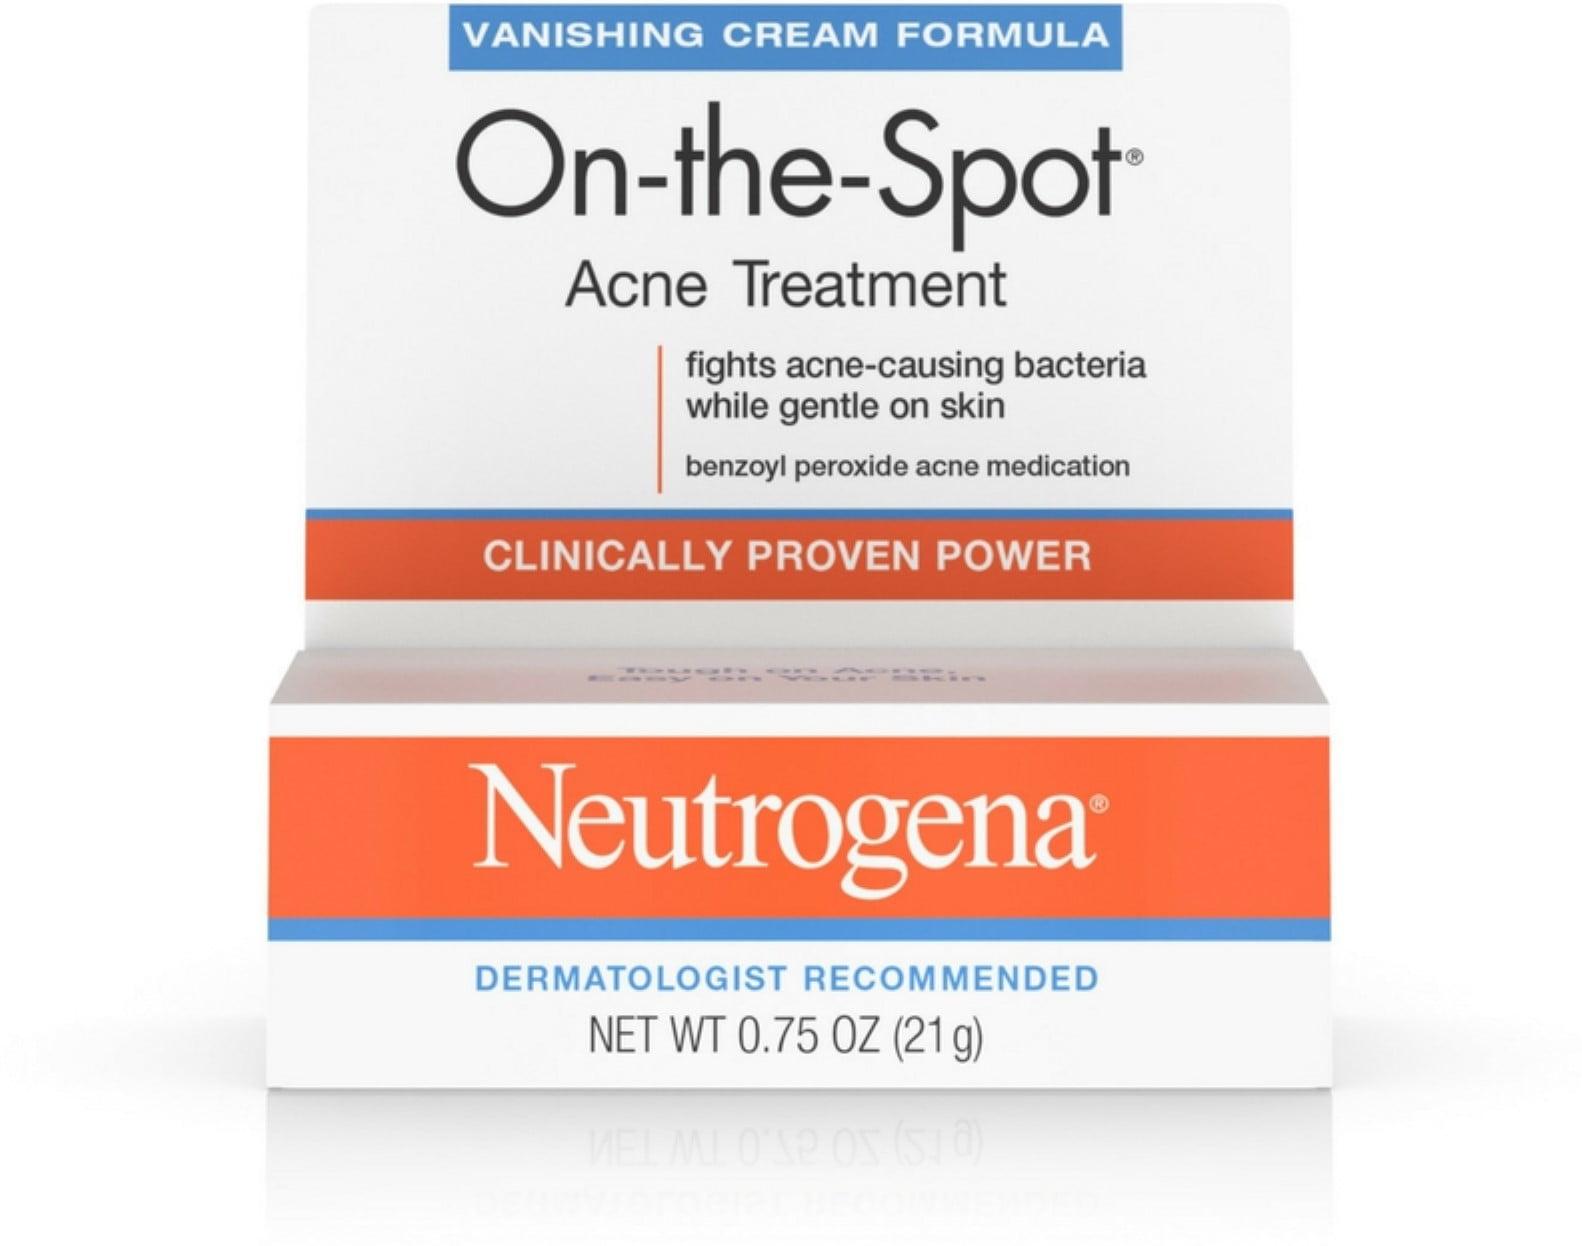 6 Pack Neutrogena On The Spot Acne Treatment Vanishing Cream